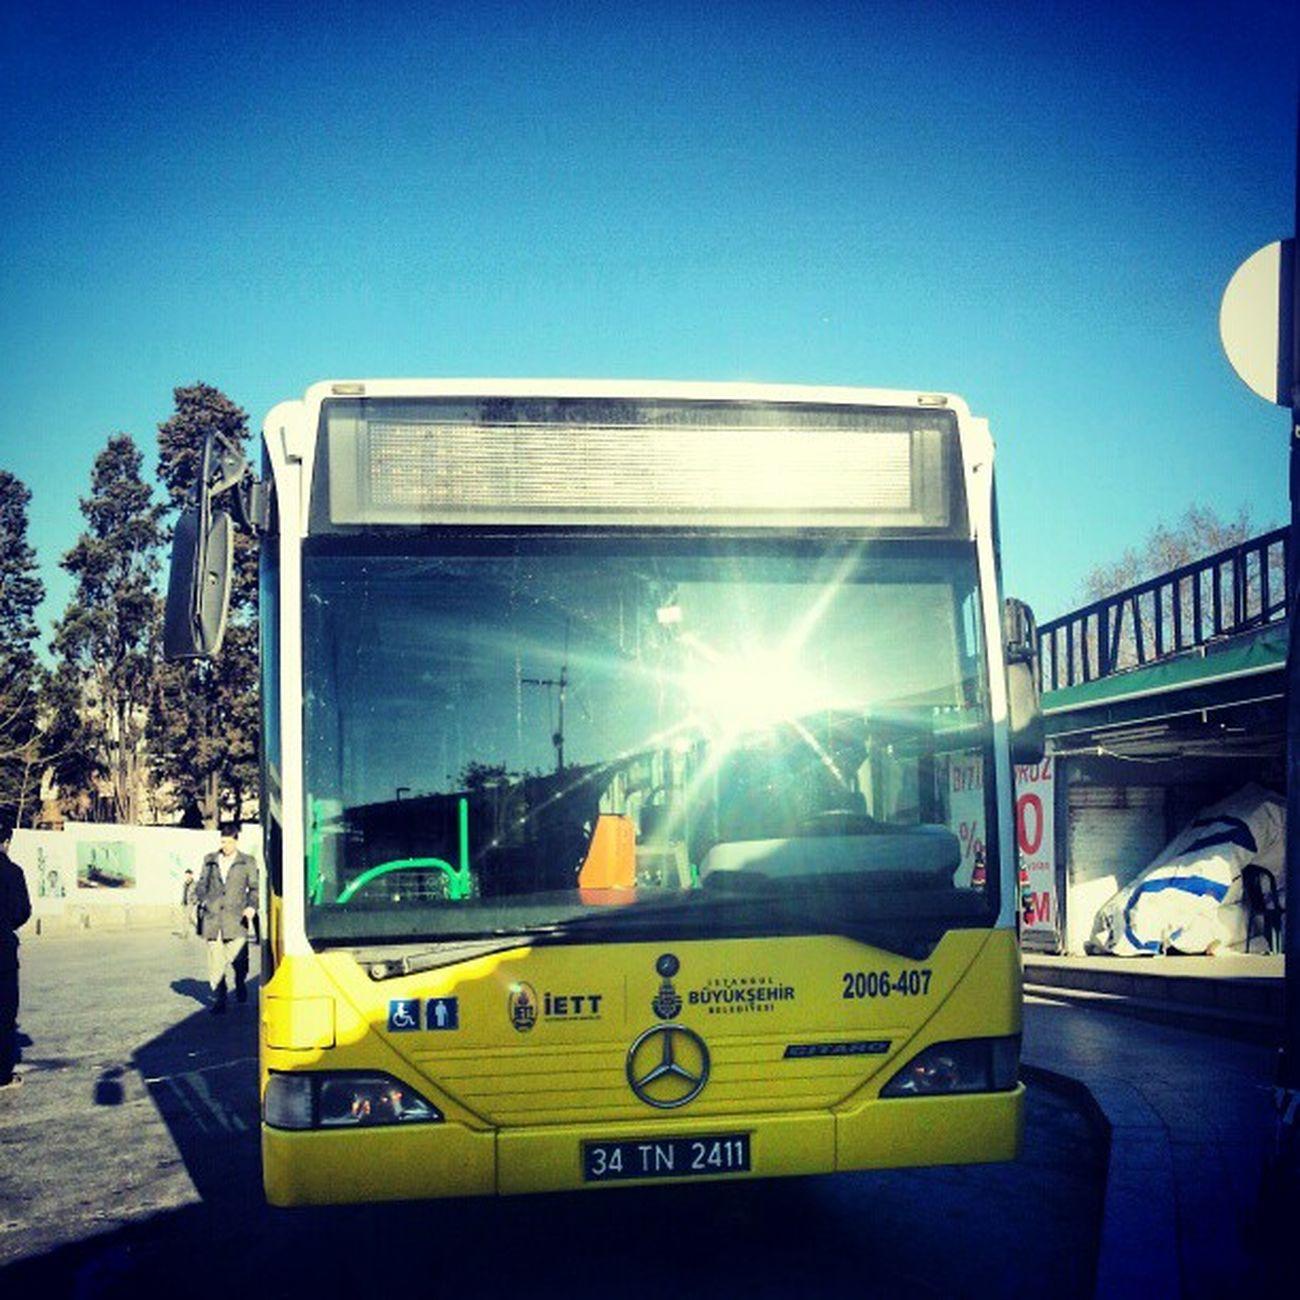 Bus Iett Mercedes Besiktas instamood igers instagood instagram instahub jj jj_forum igersturkey instafun